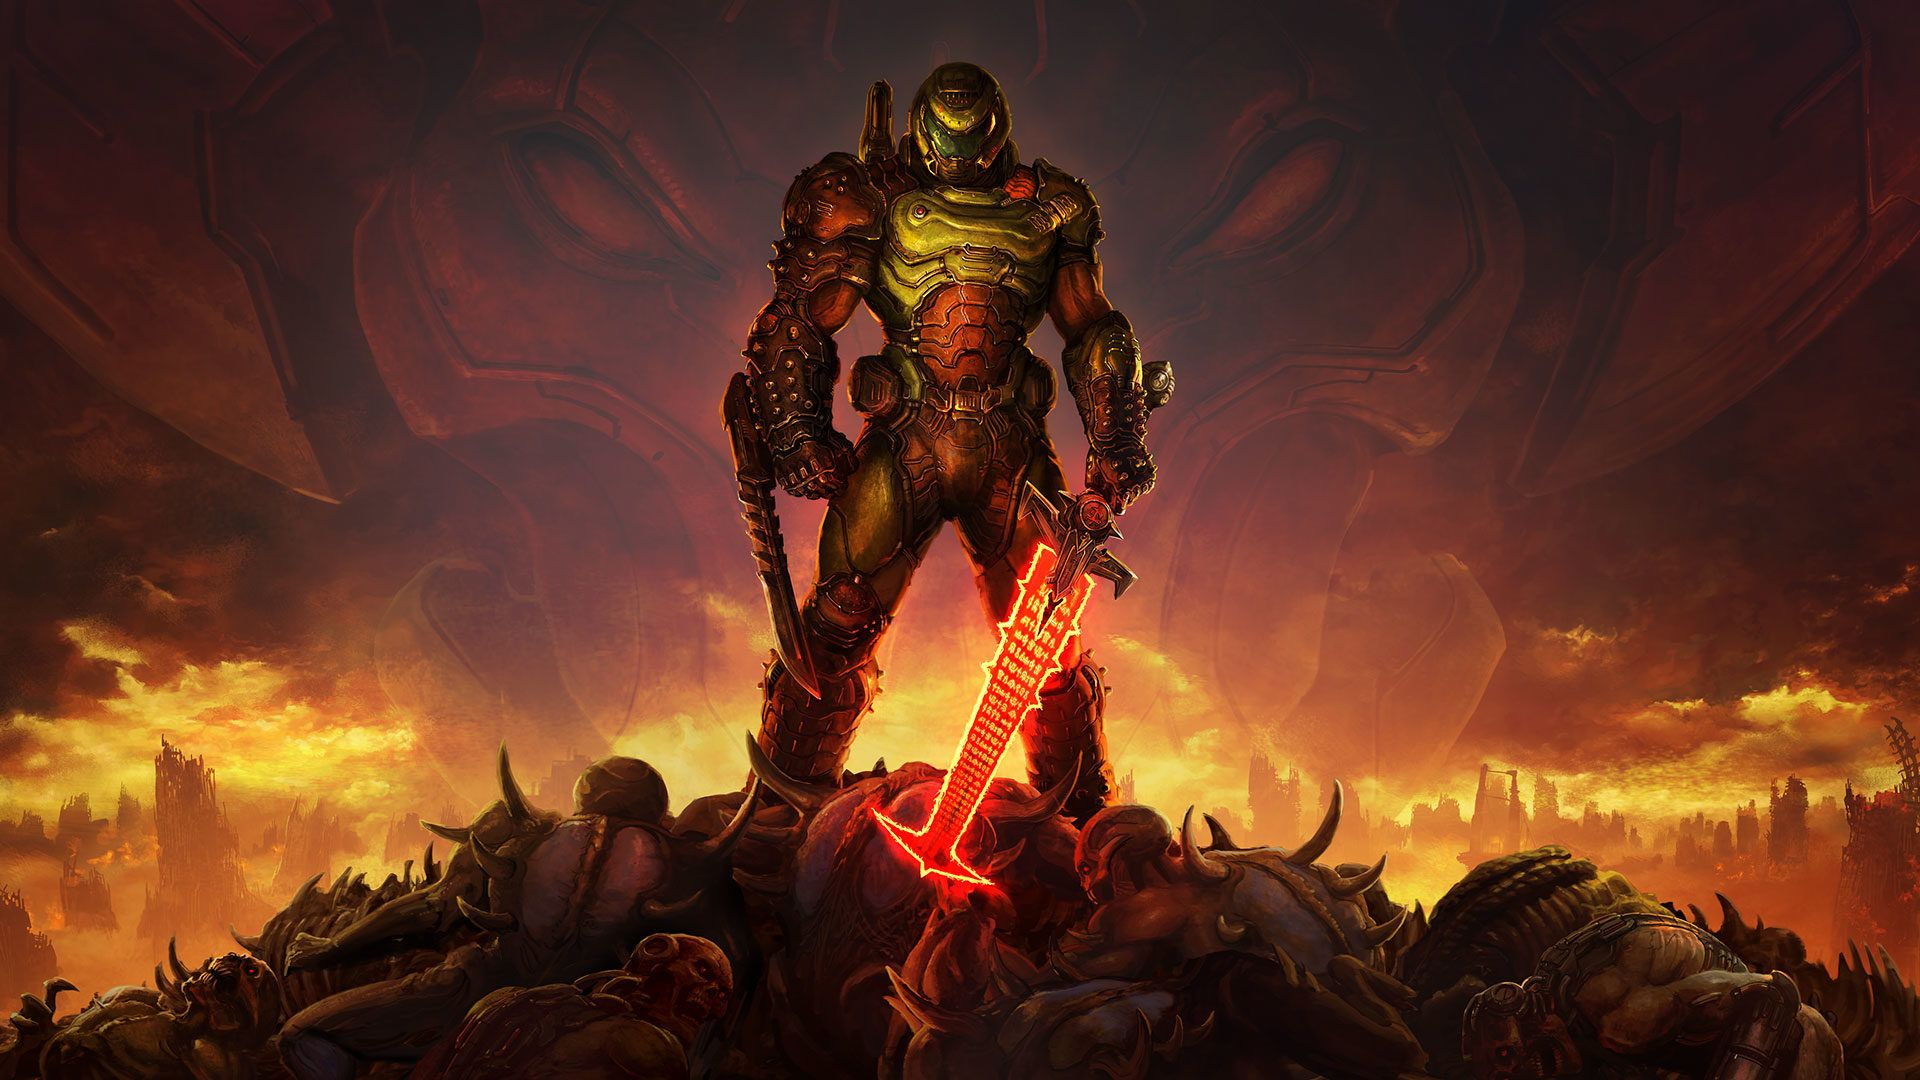 Doom Slayer Symbol Wallpapers - Wallpaper Cave